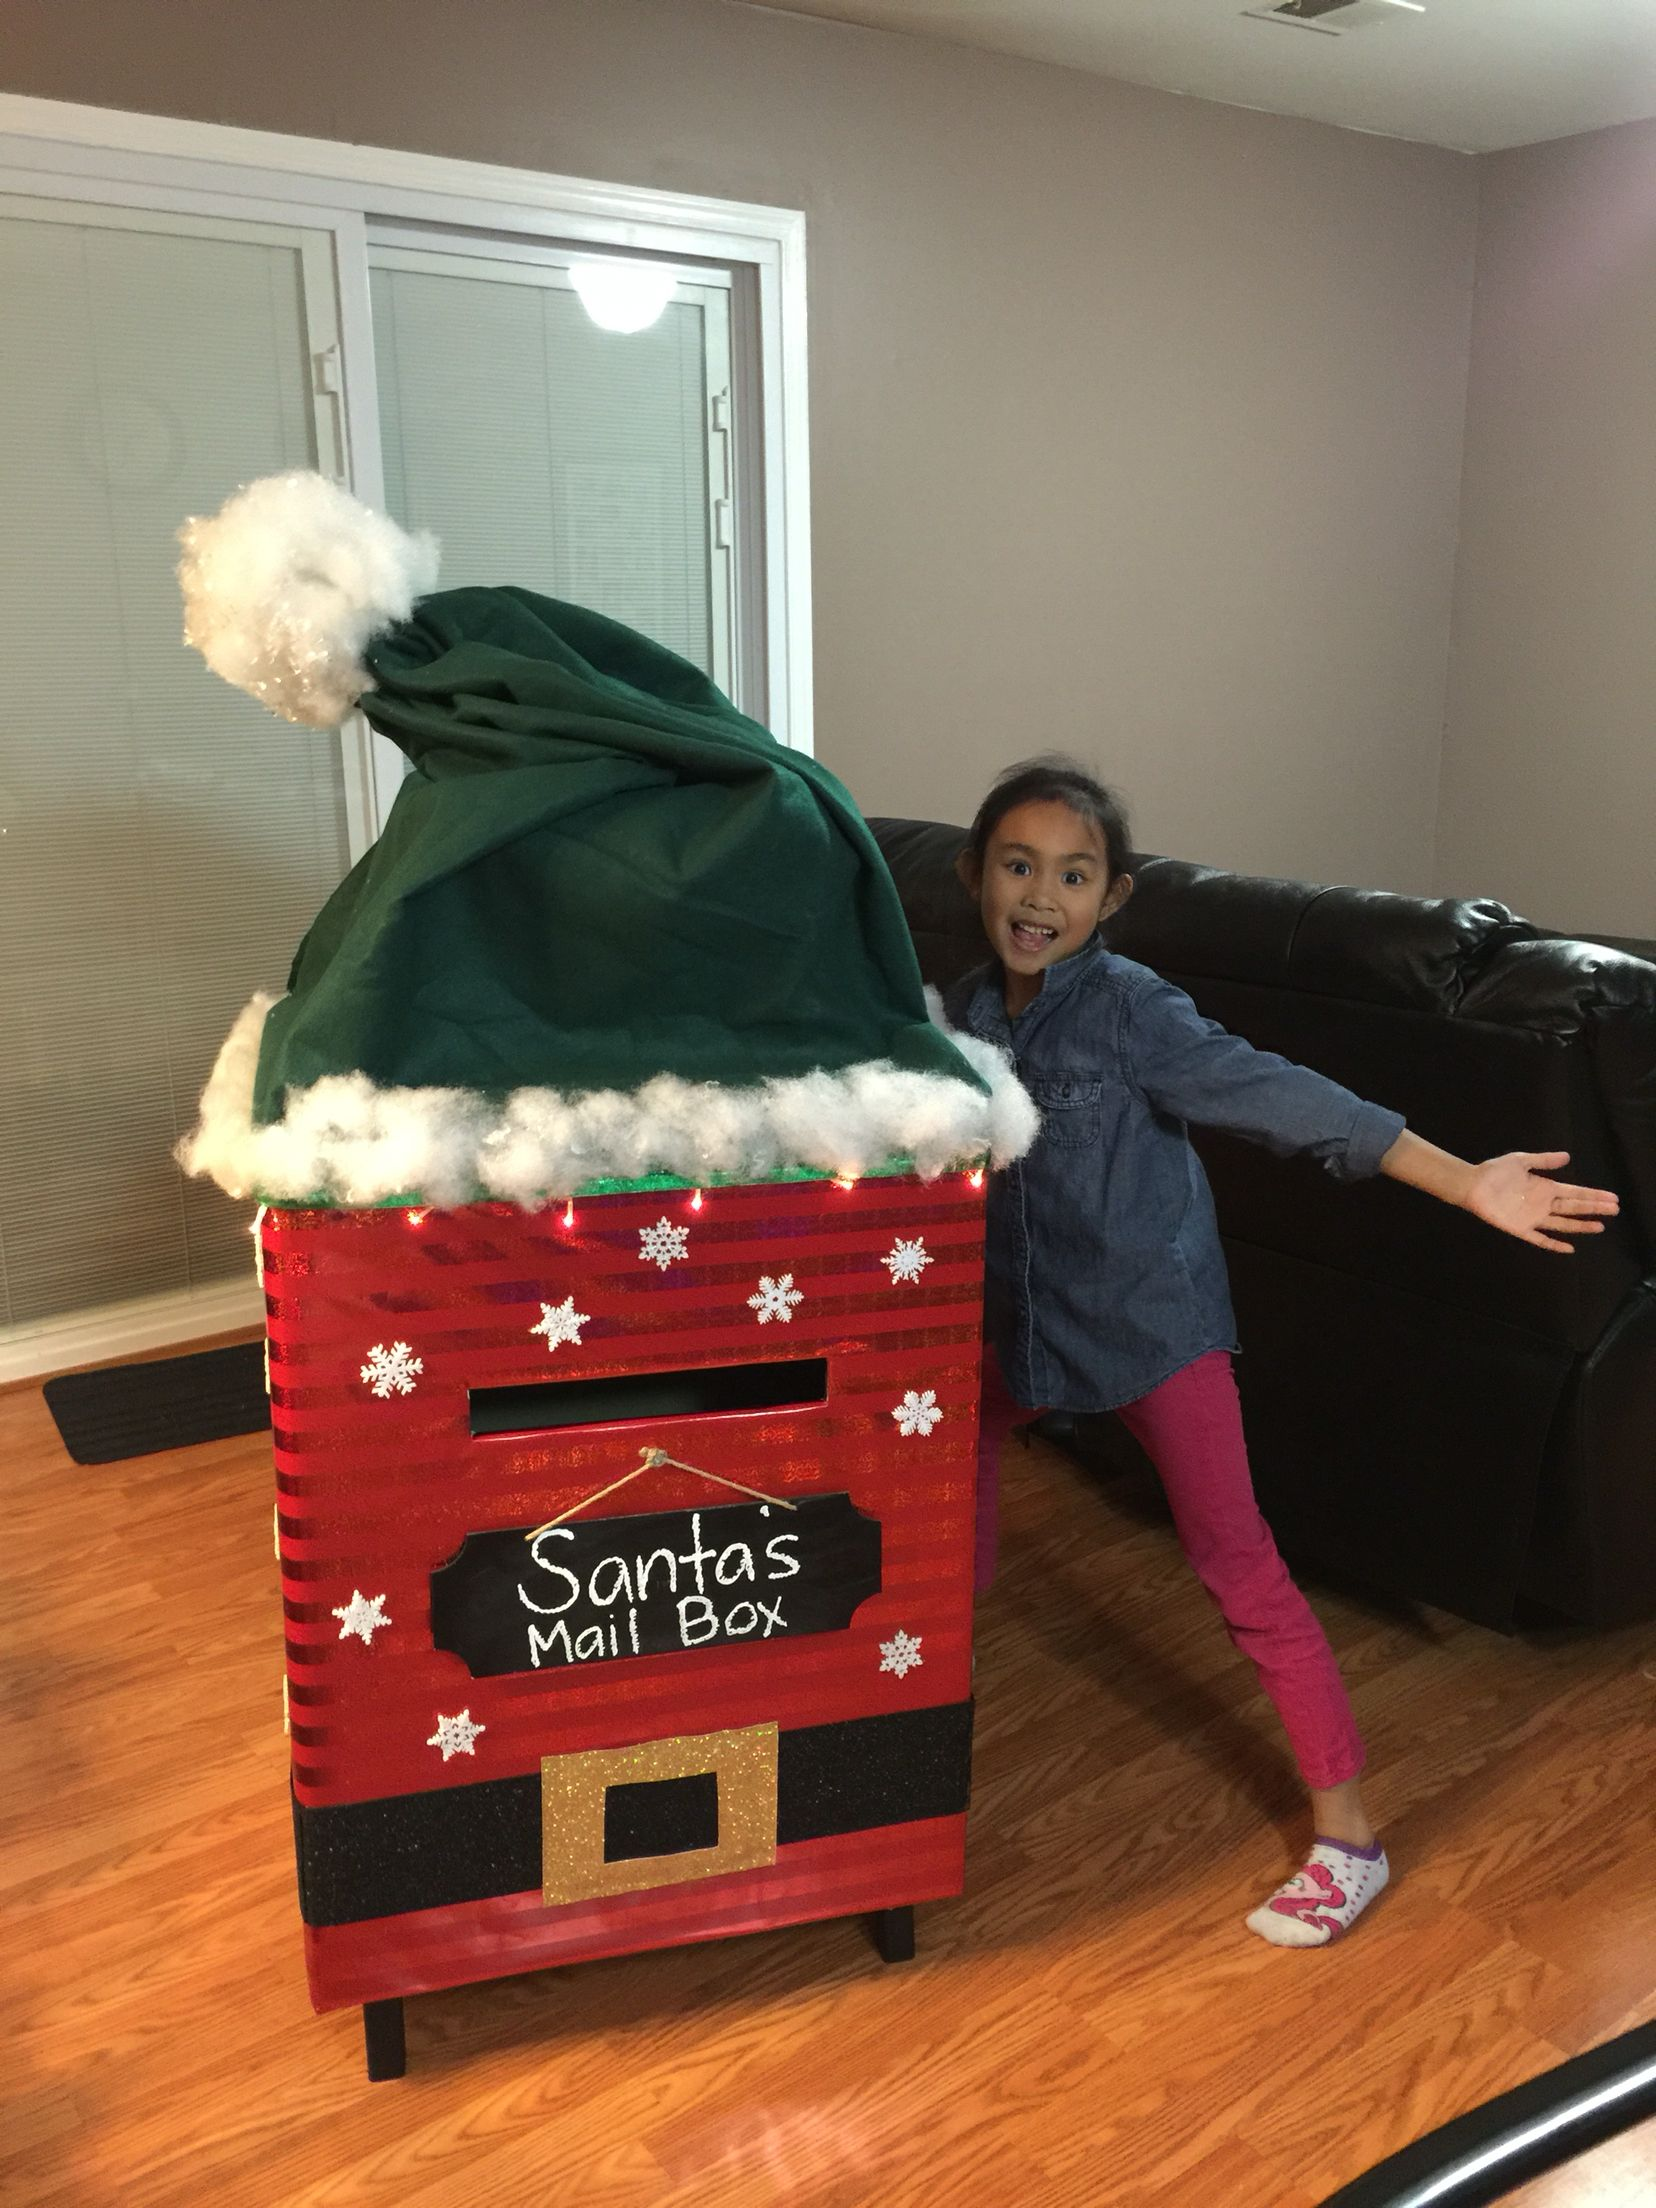 Santa S Mail Box Made Of Cardboard Christmas Toy Box